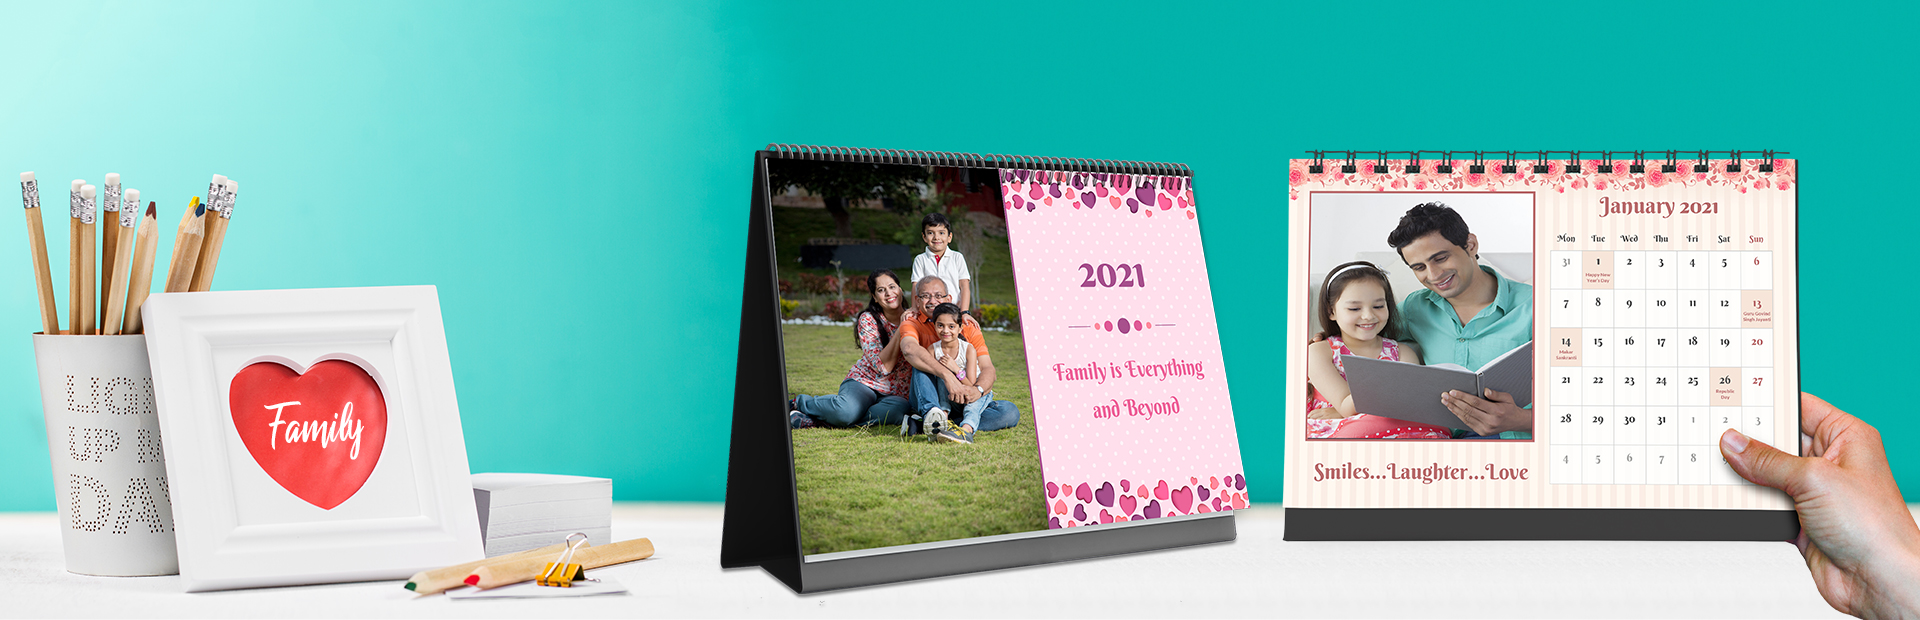 Family Bonds Photo Calendars Online